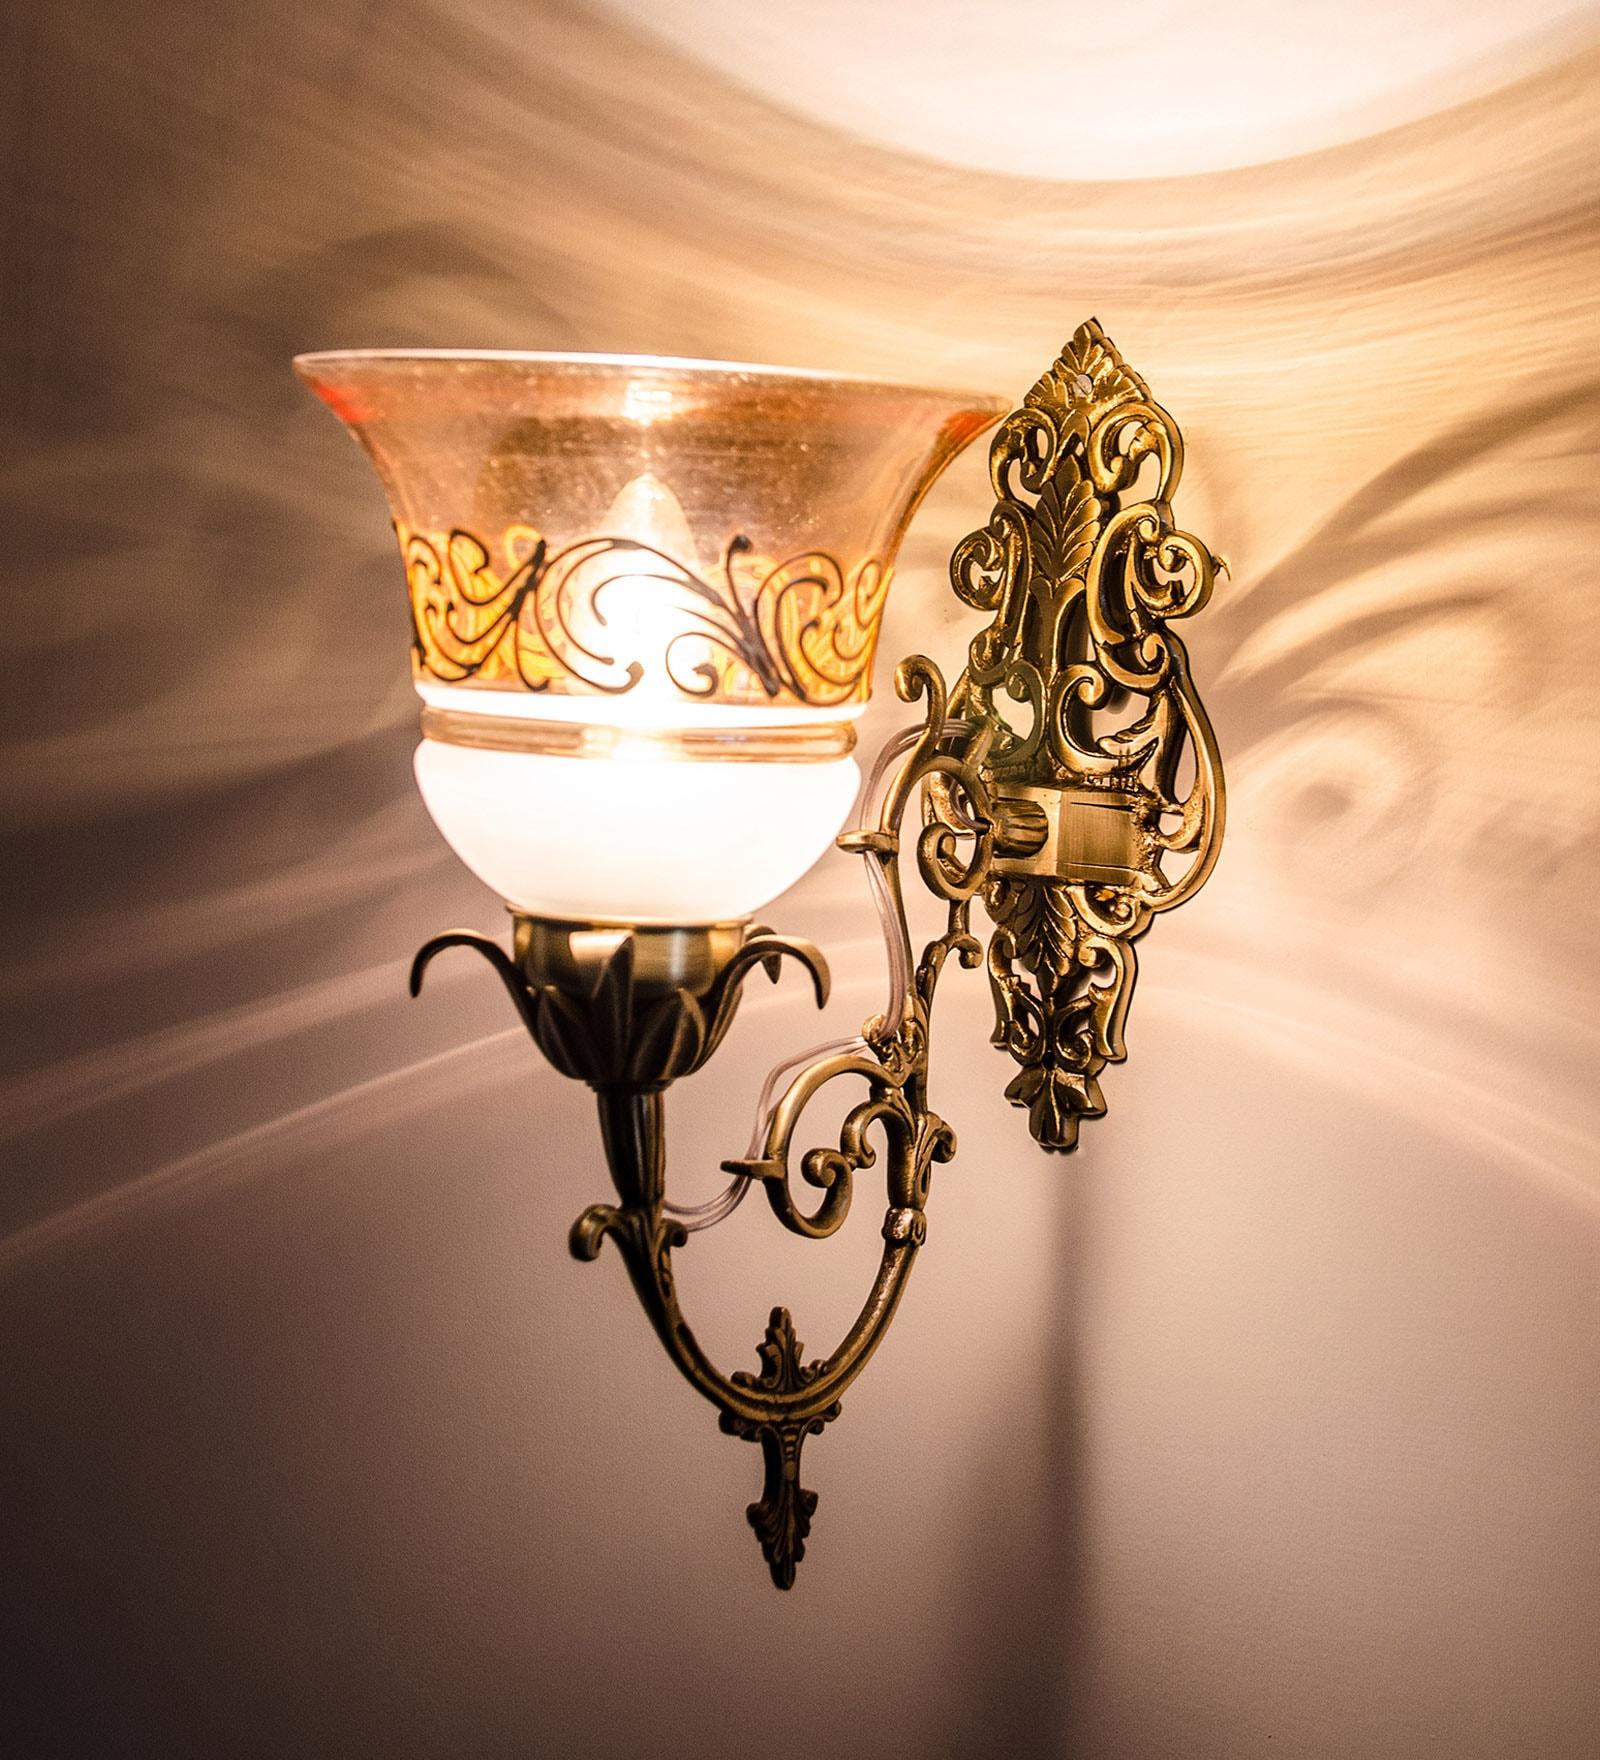 Fos Lighting White & Gold Glass Wall Light